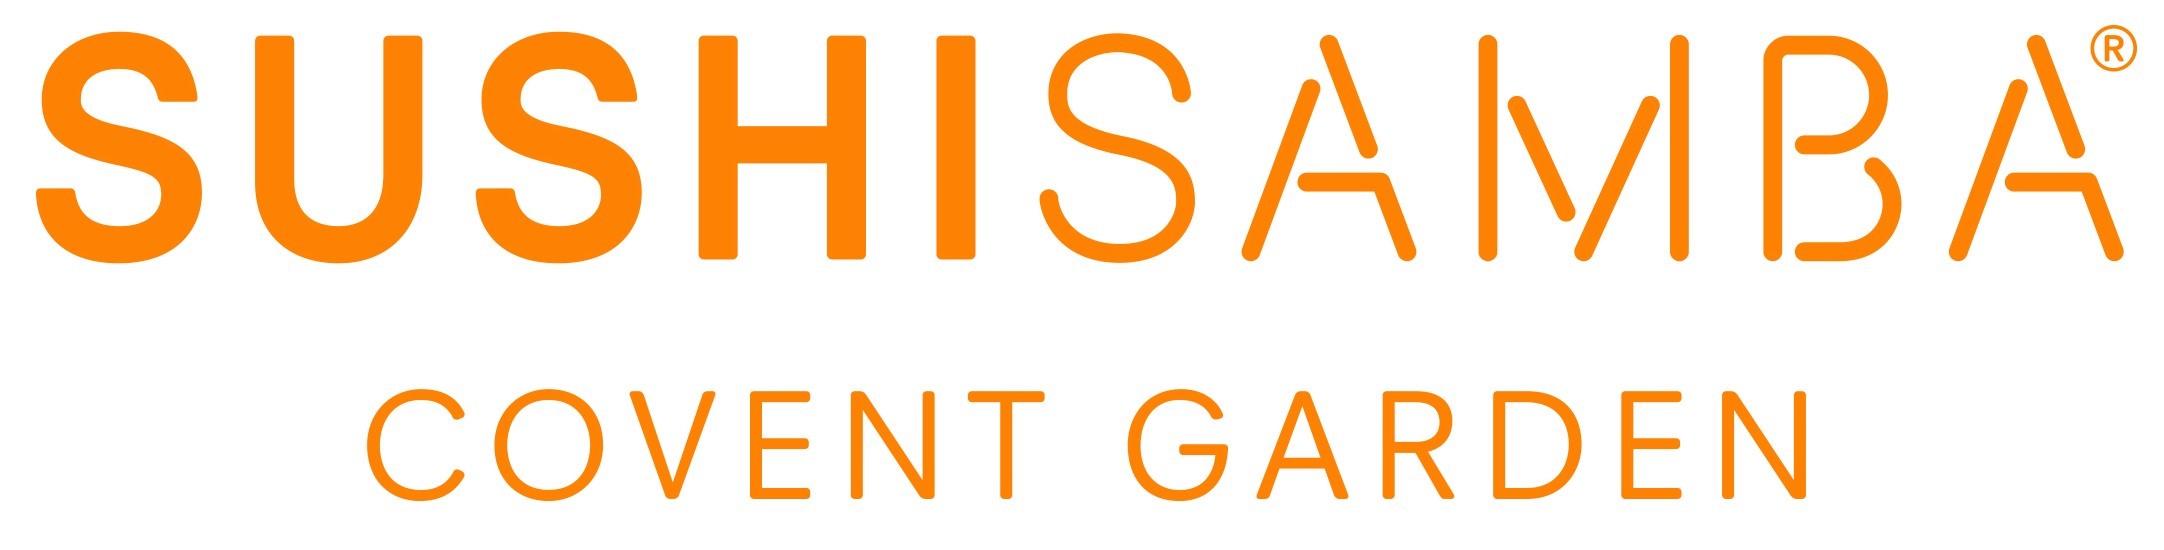 SUSHISAMBA Covent Garden logo